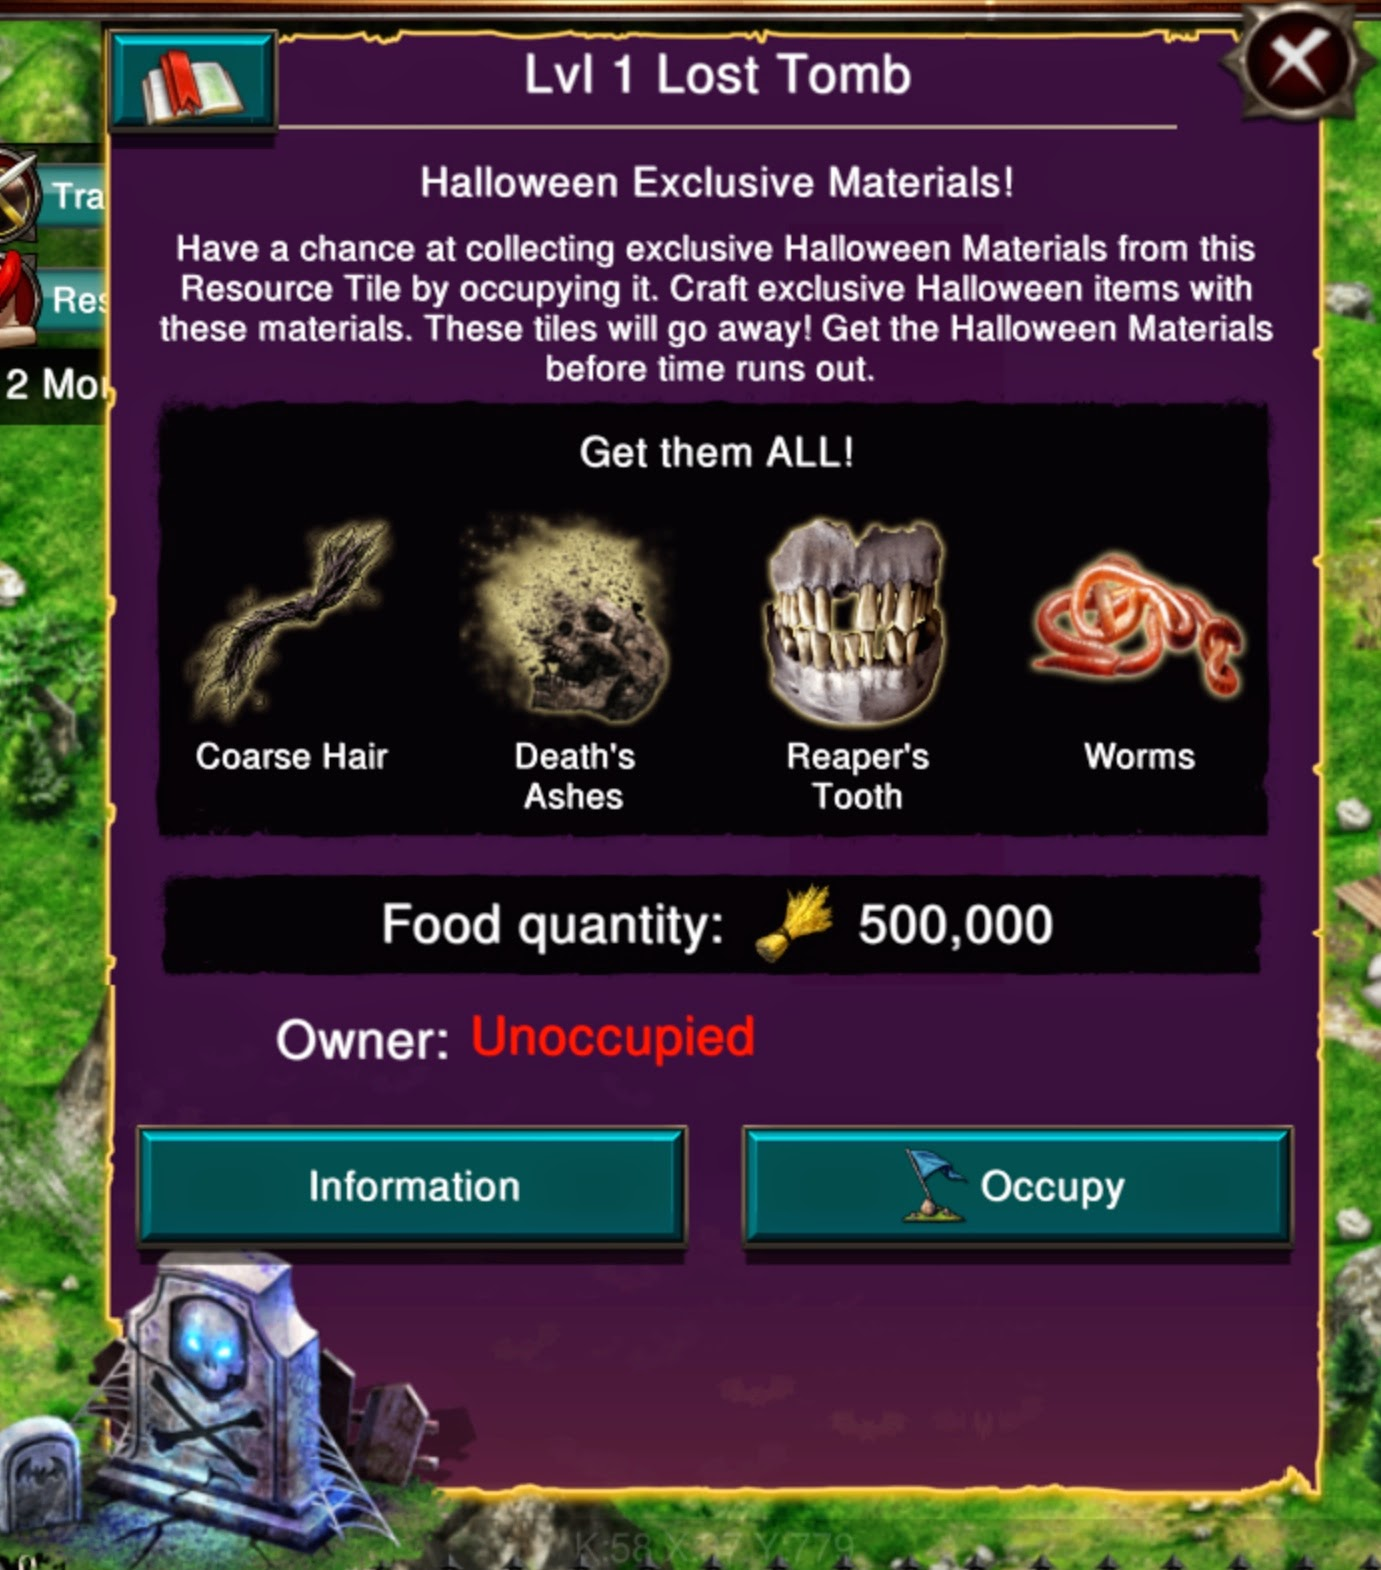 Monster Resource Tile